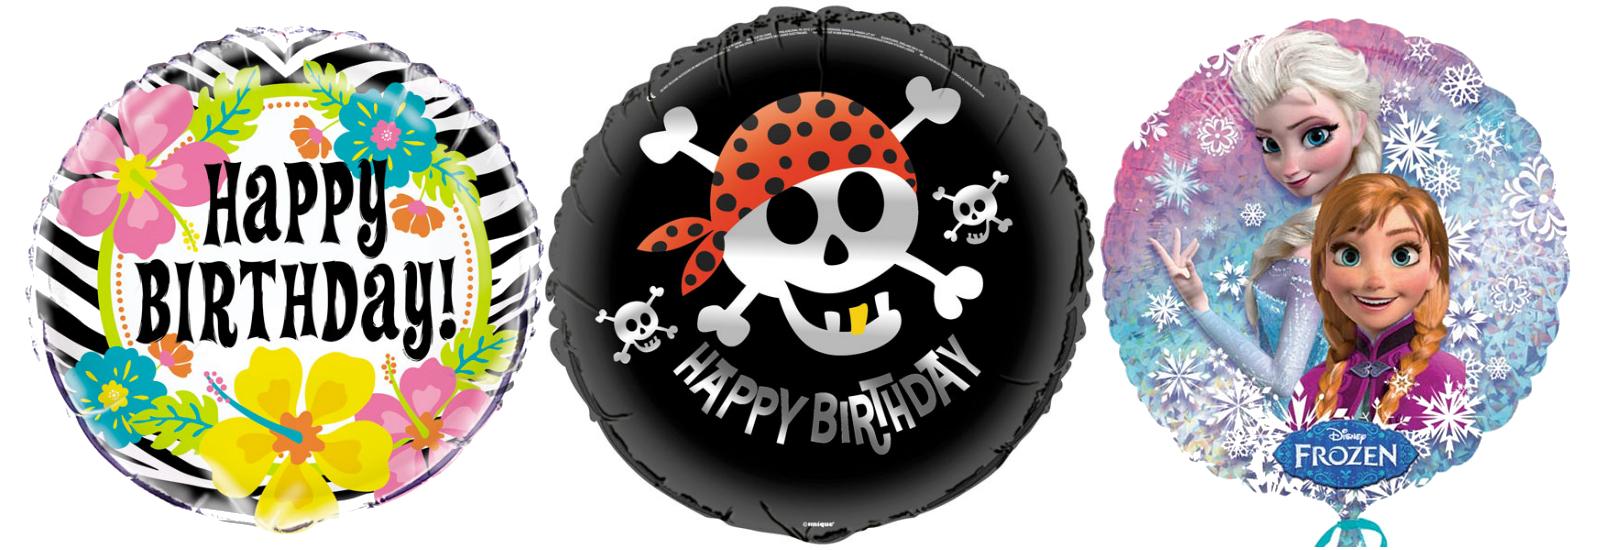 New Balloons Partyrama